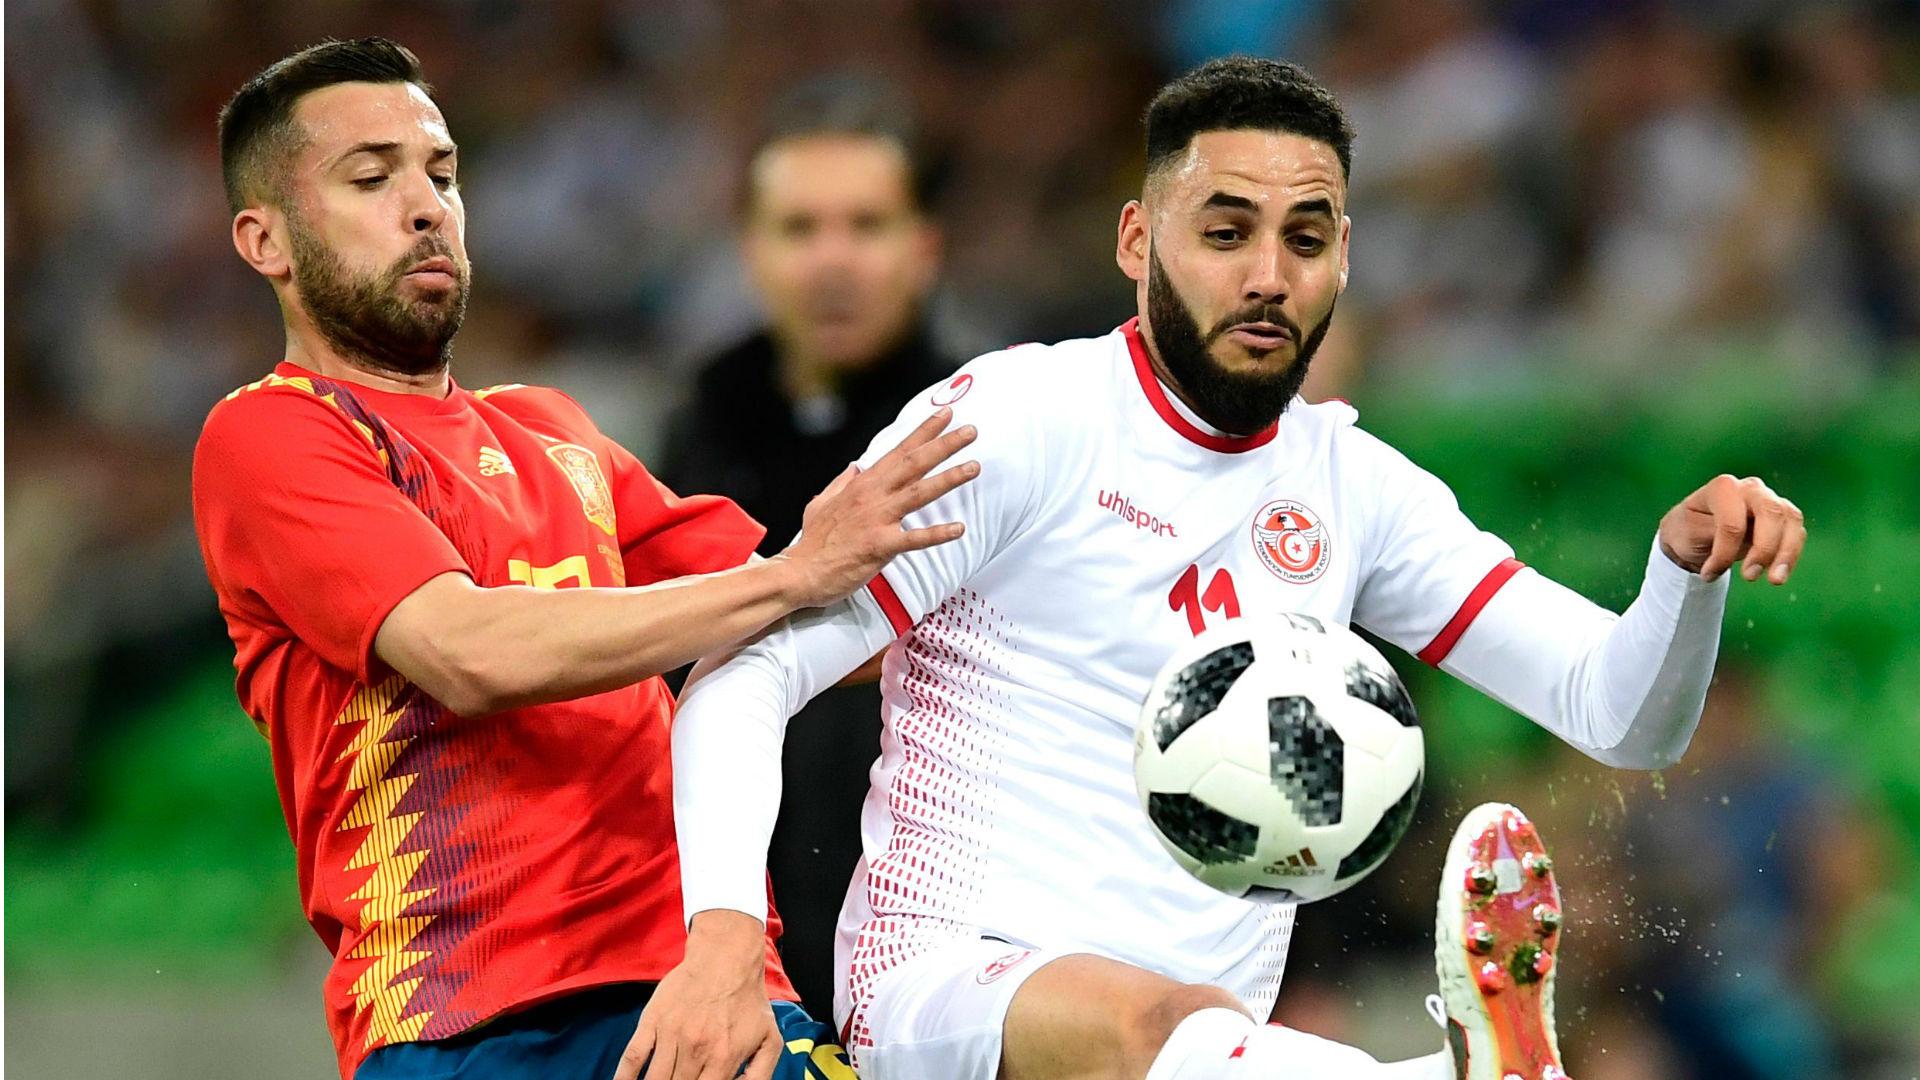 Jordi Alba Dylan Bronn Tunisia Spain international friendly 2018